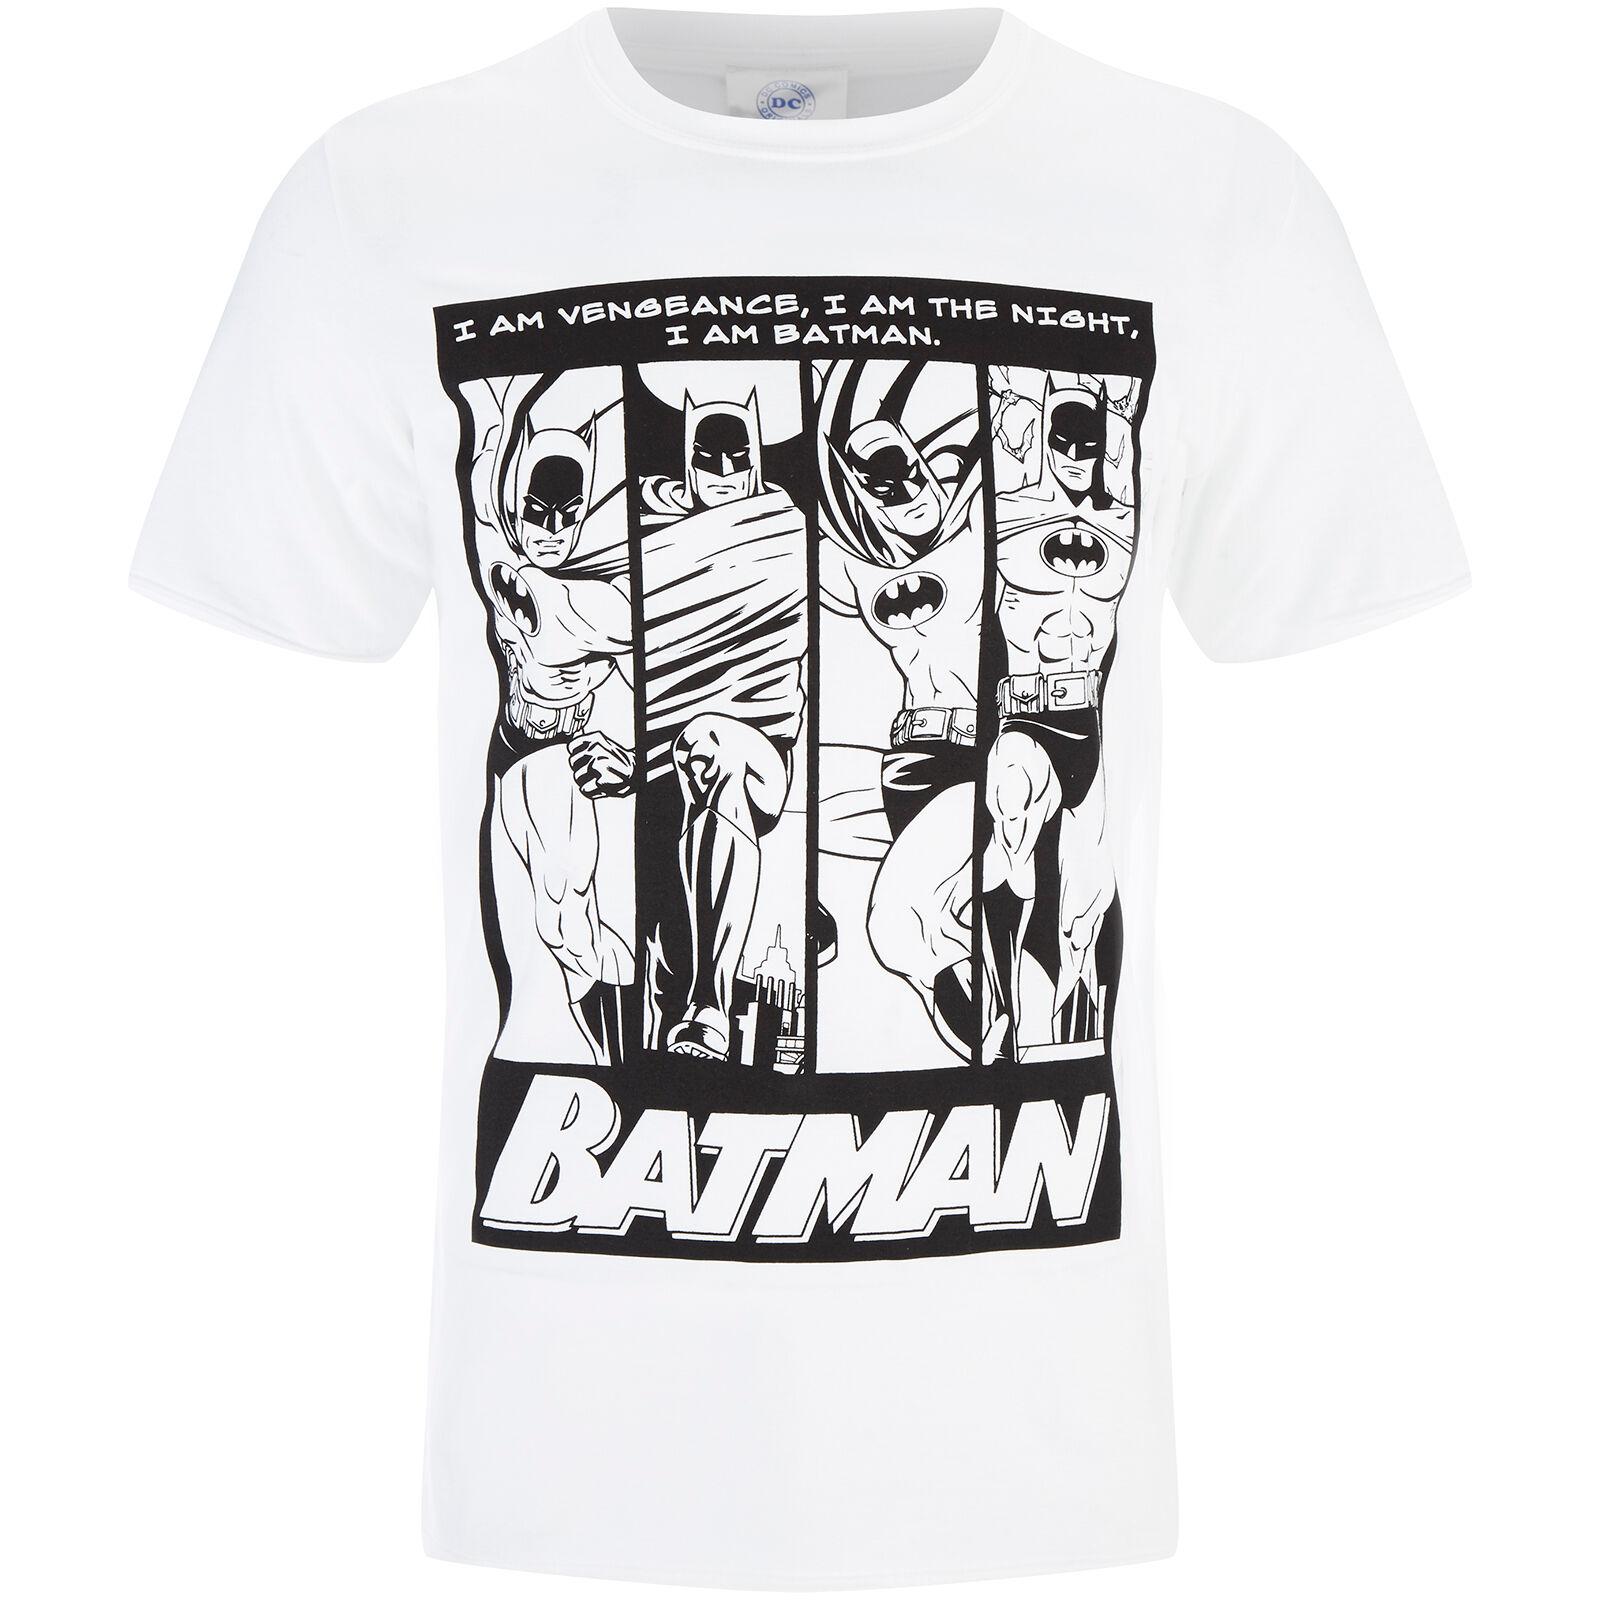 Geek Clothing DC Comics Men's Batman I am Batman T-Shirt - White - XL - White